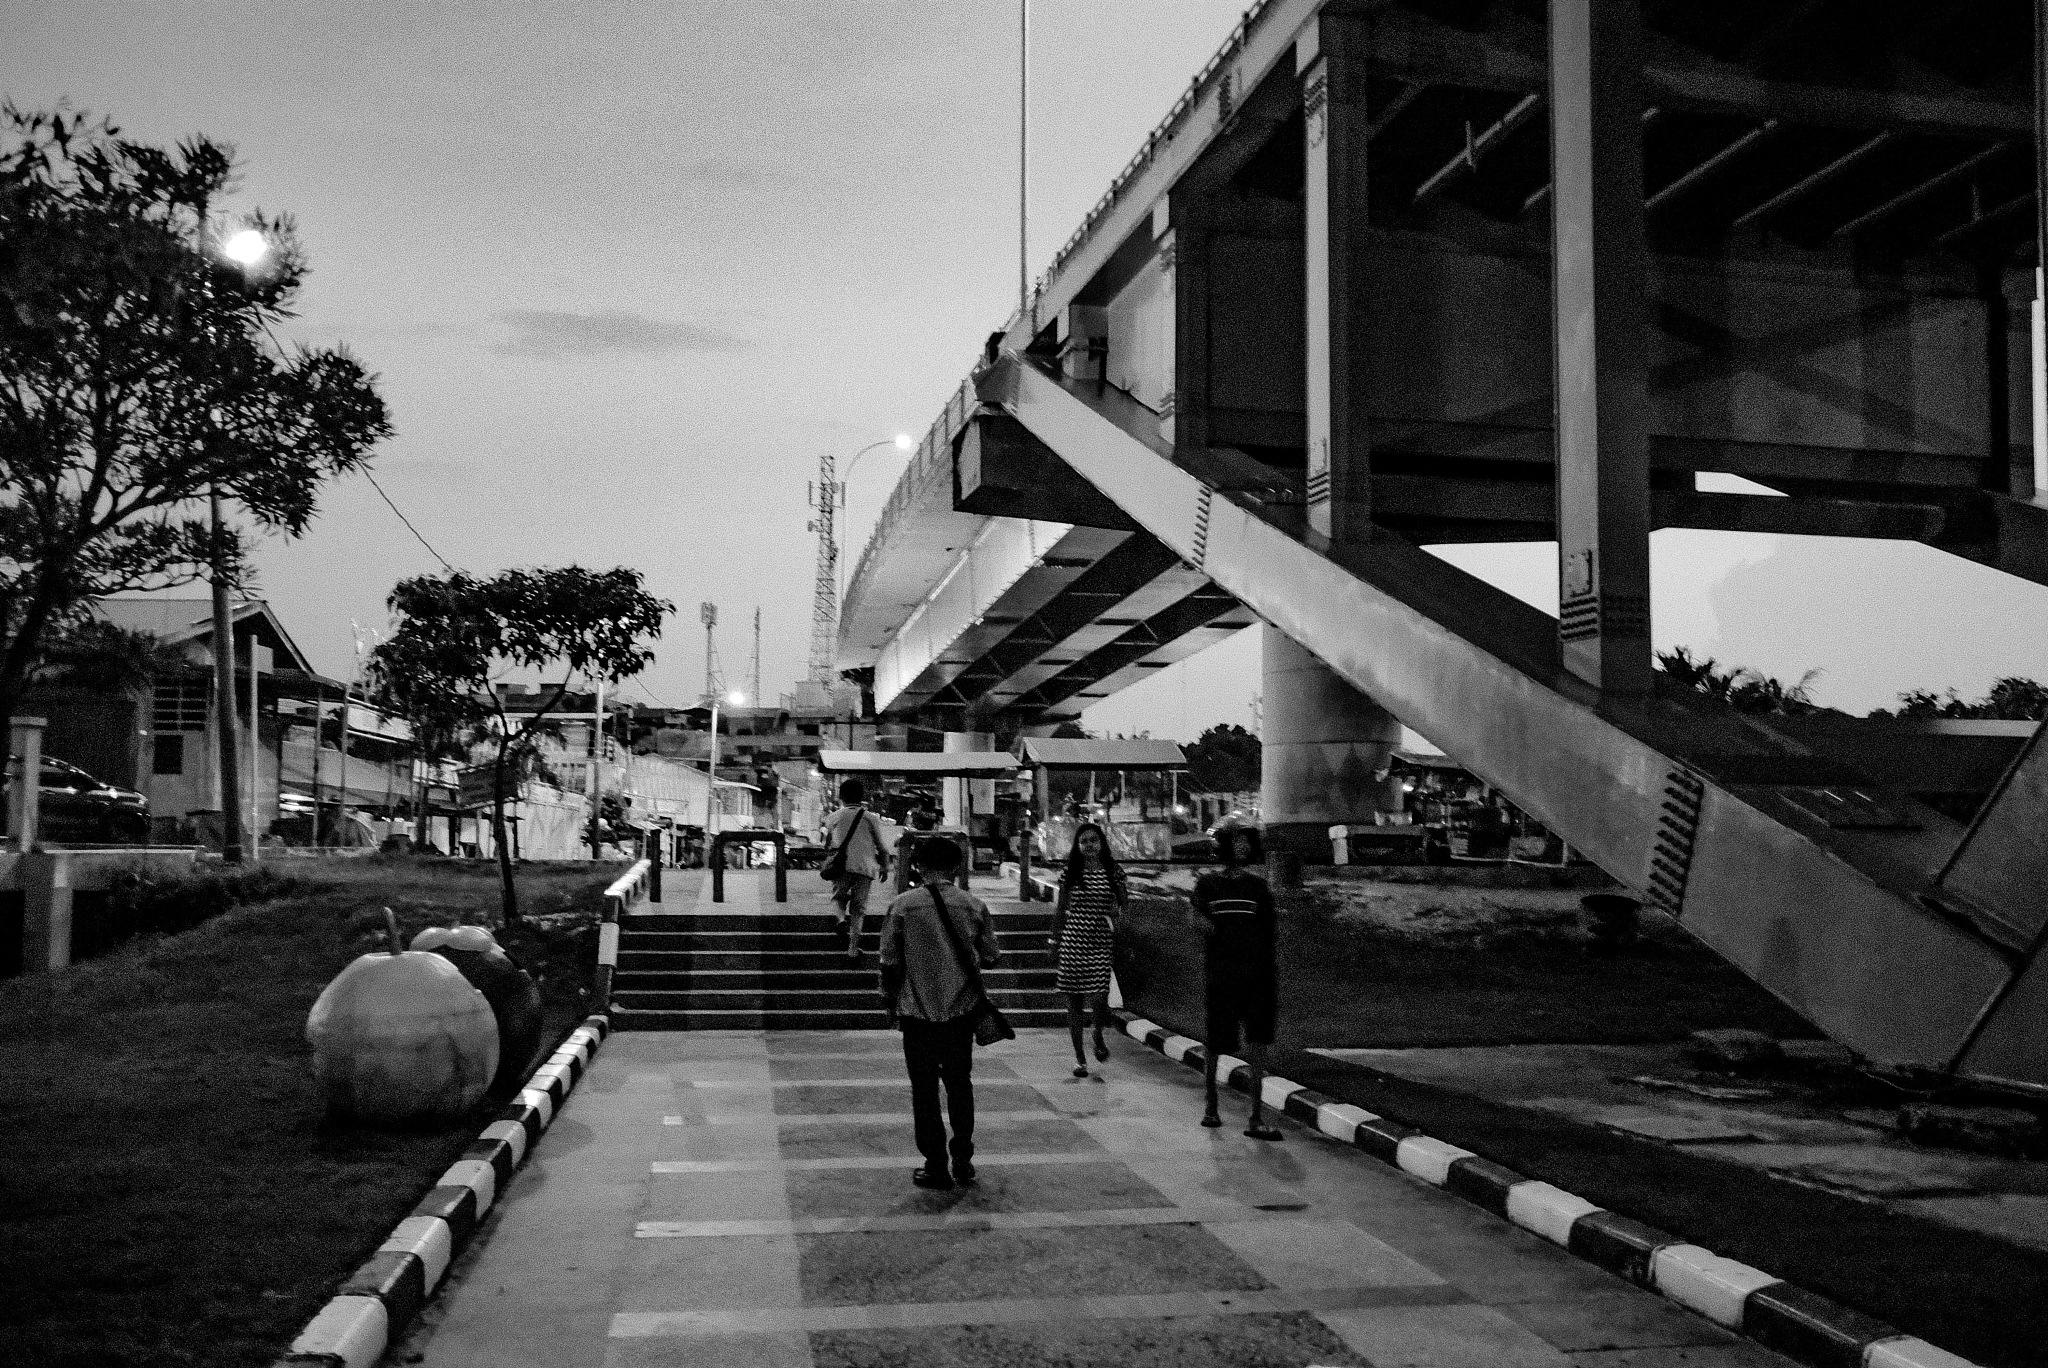 Beneath the bridge by kukuhnd